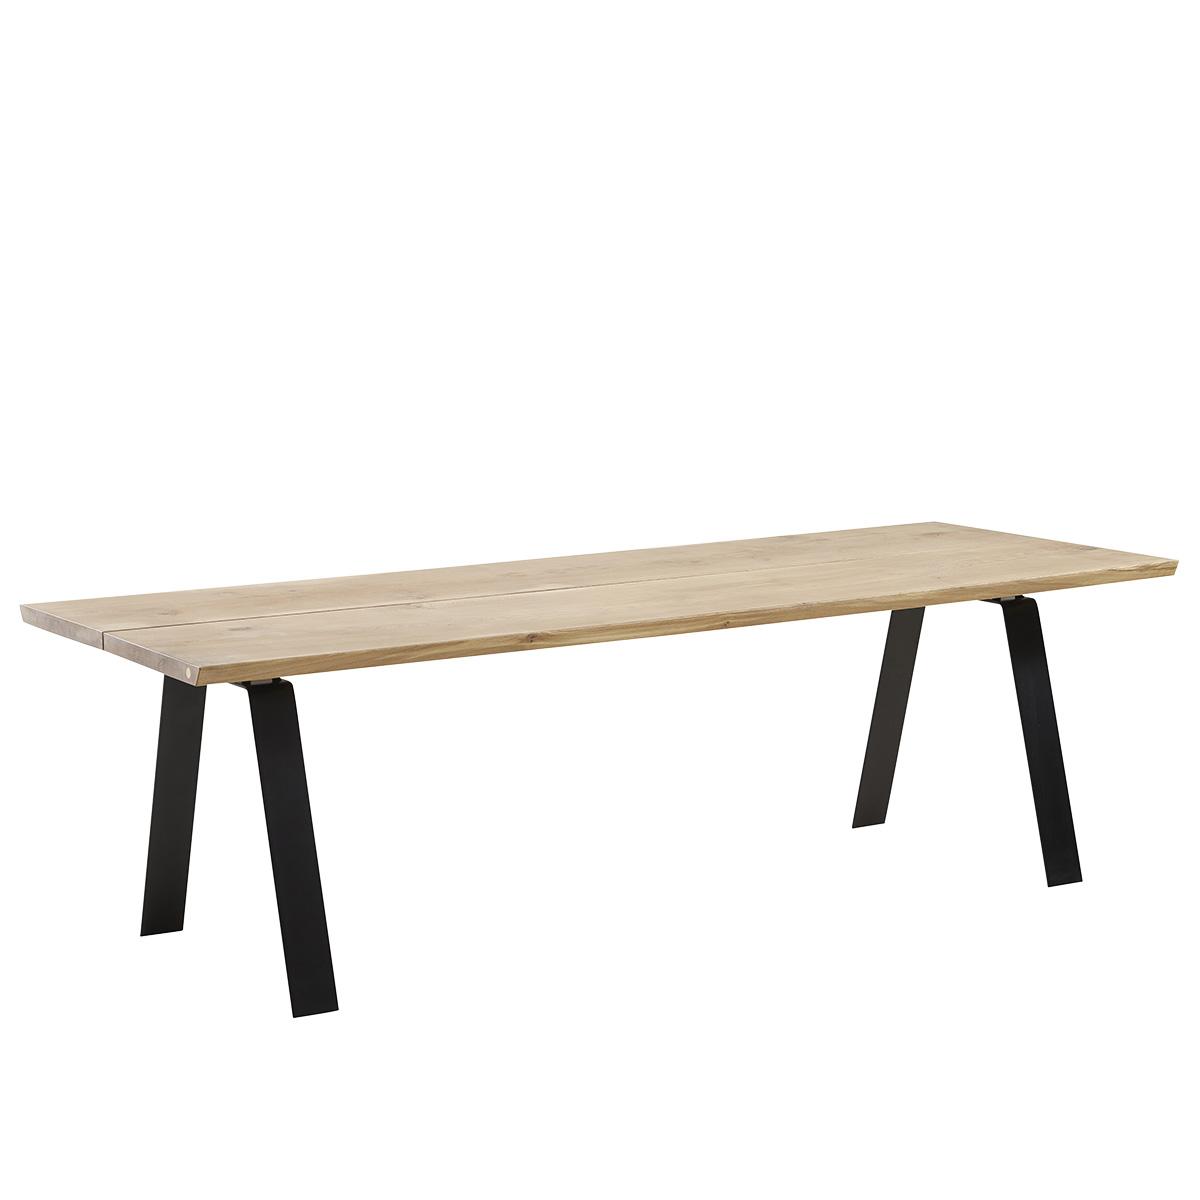 Træfolk plankebord - Heimdal - Eg/Metal